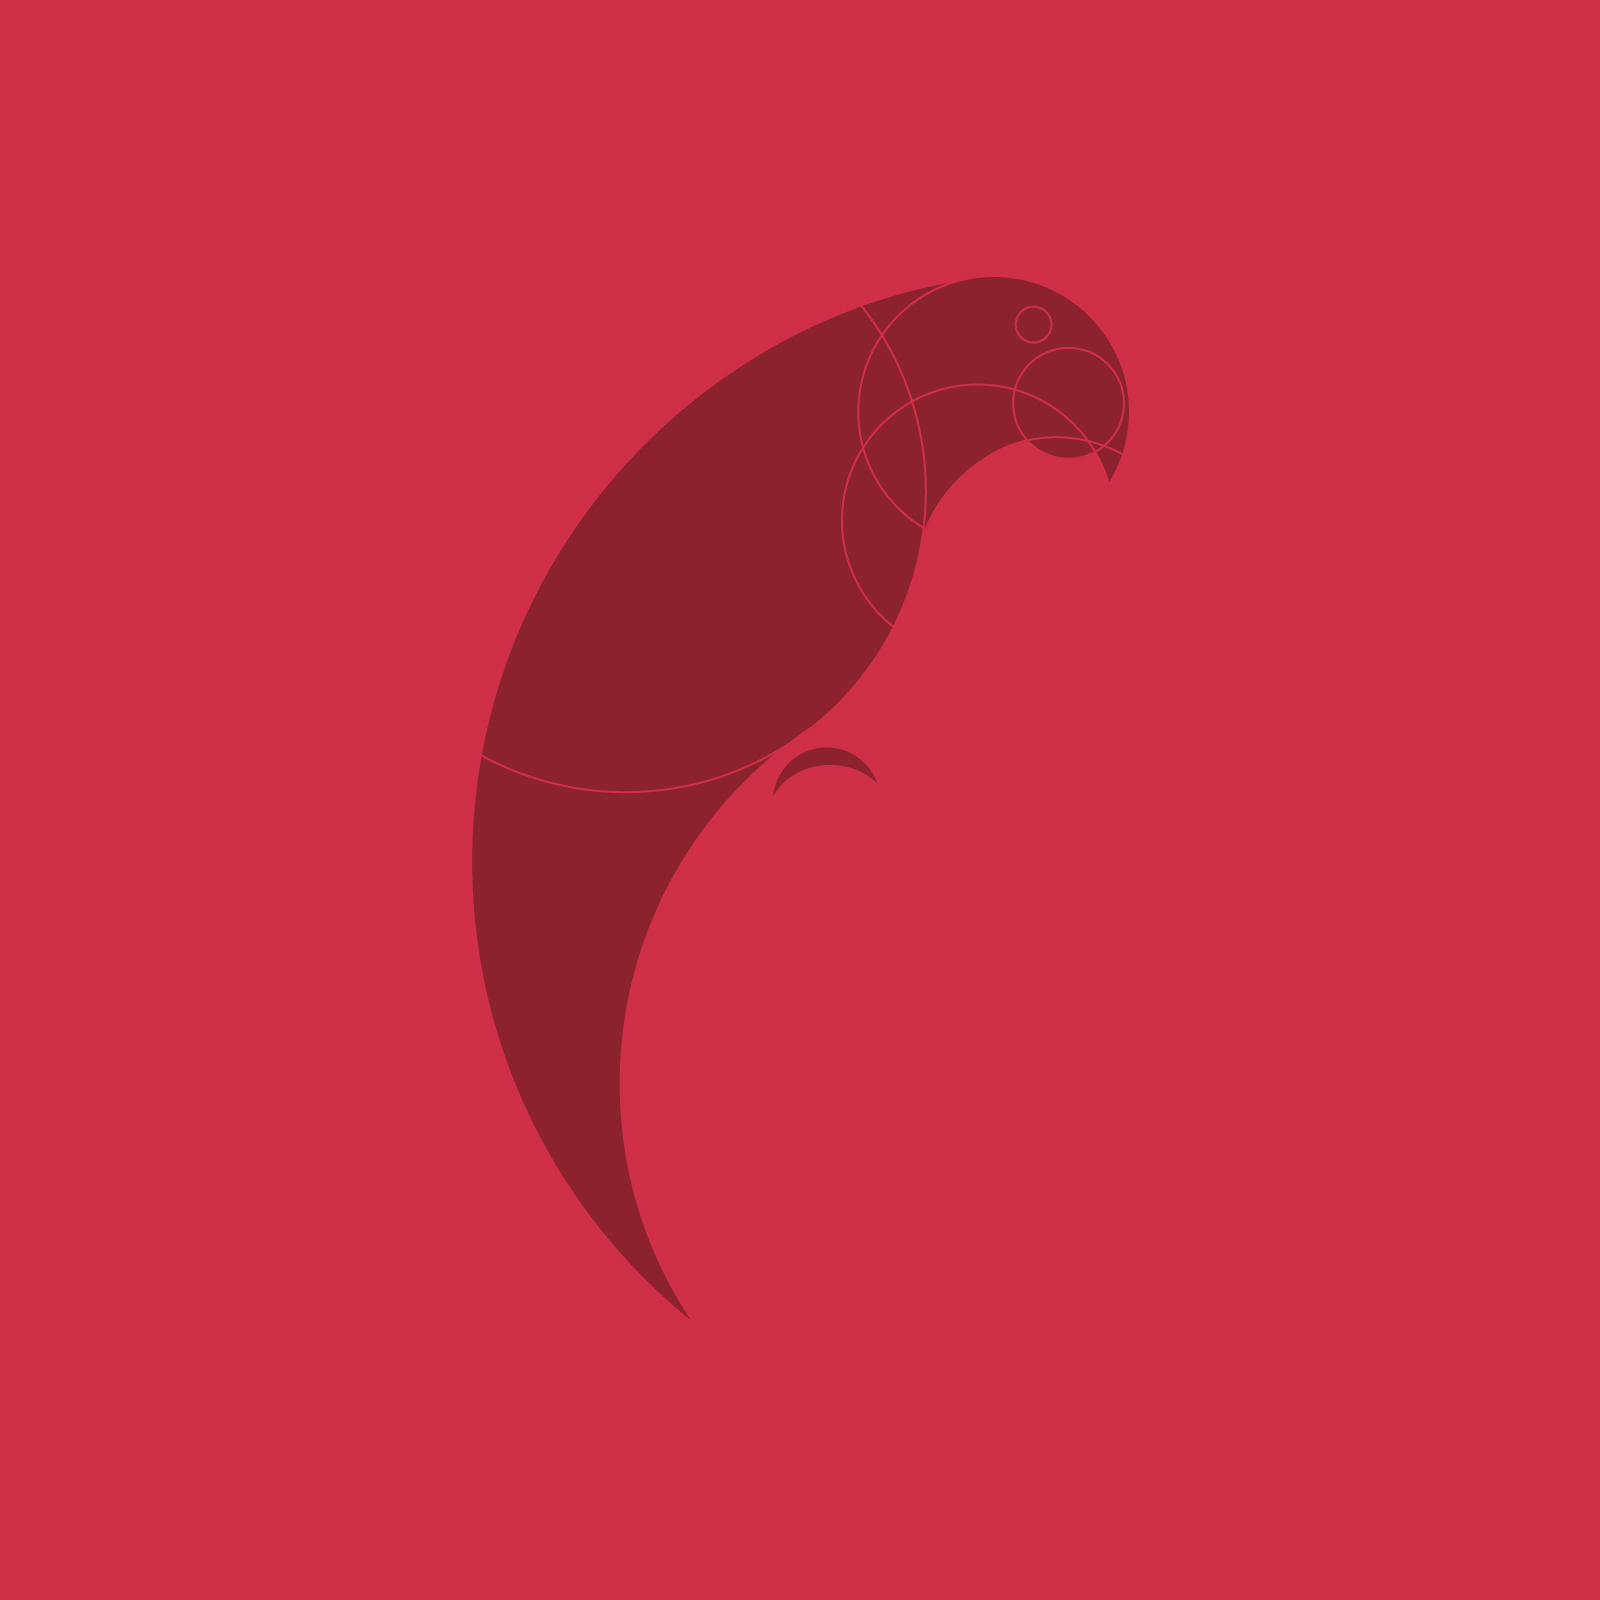 https://www.orlandinifrancesco.com/wp/wp-content/uploads/2019/01/Logo-Pappagallo-6.jpg